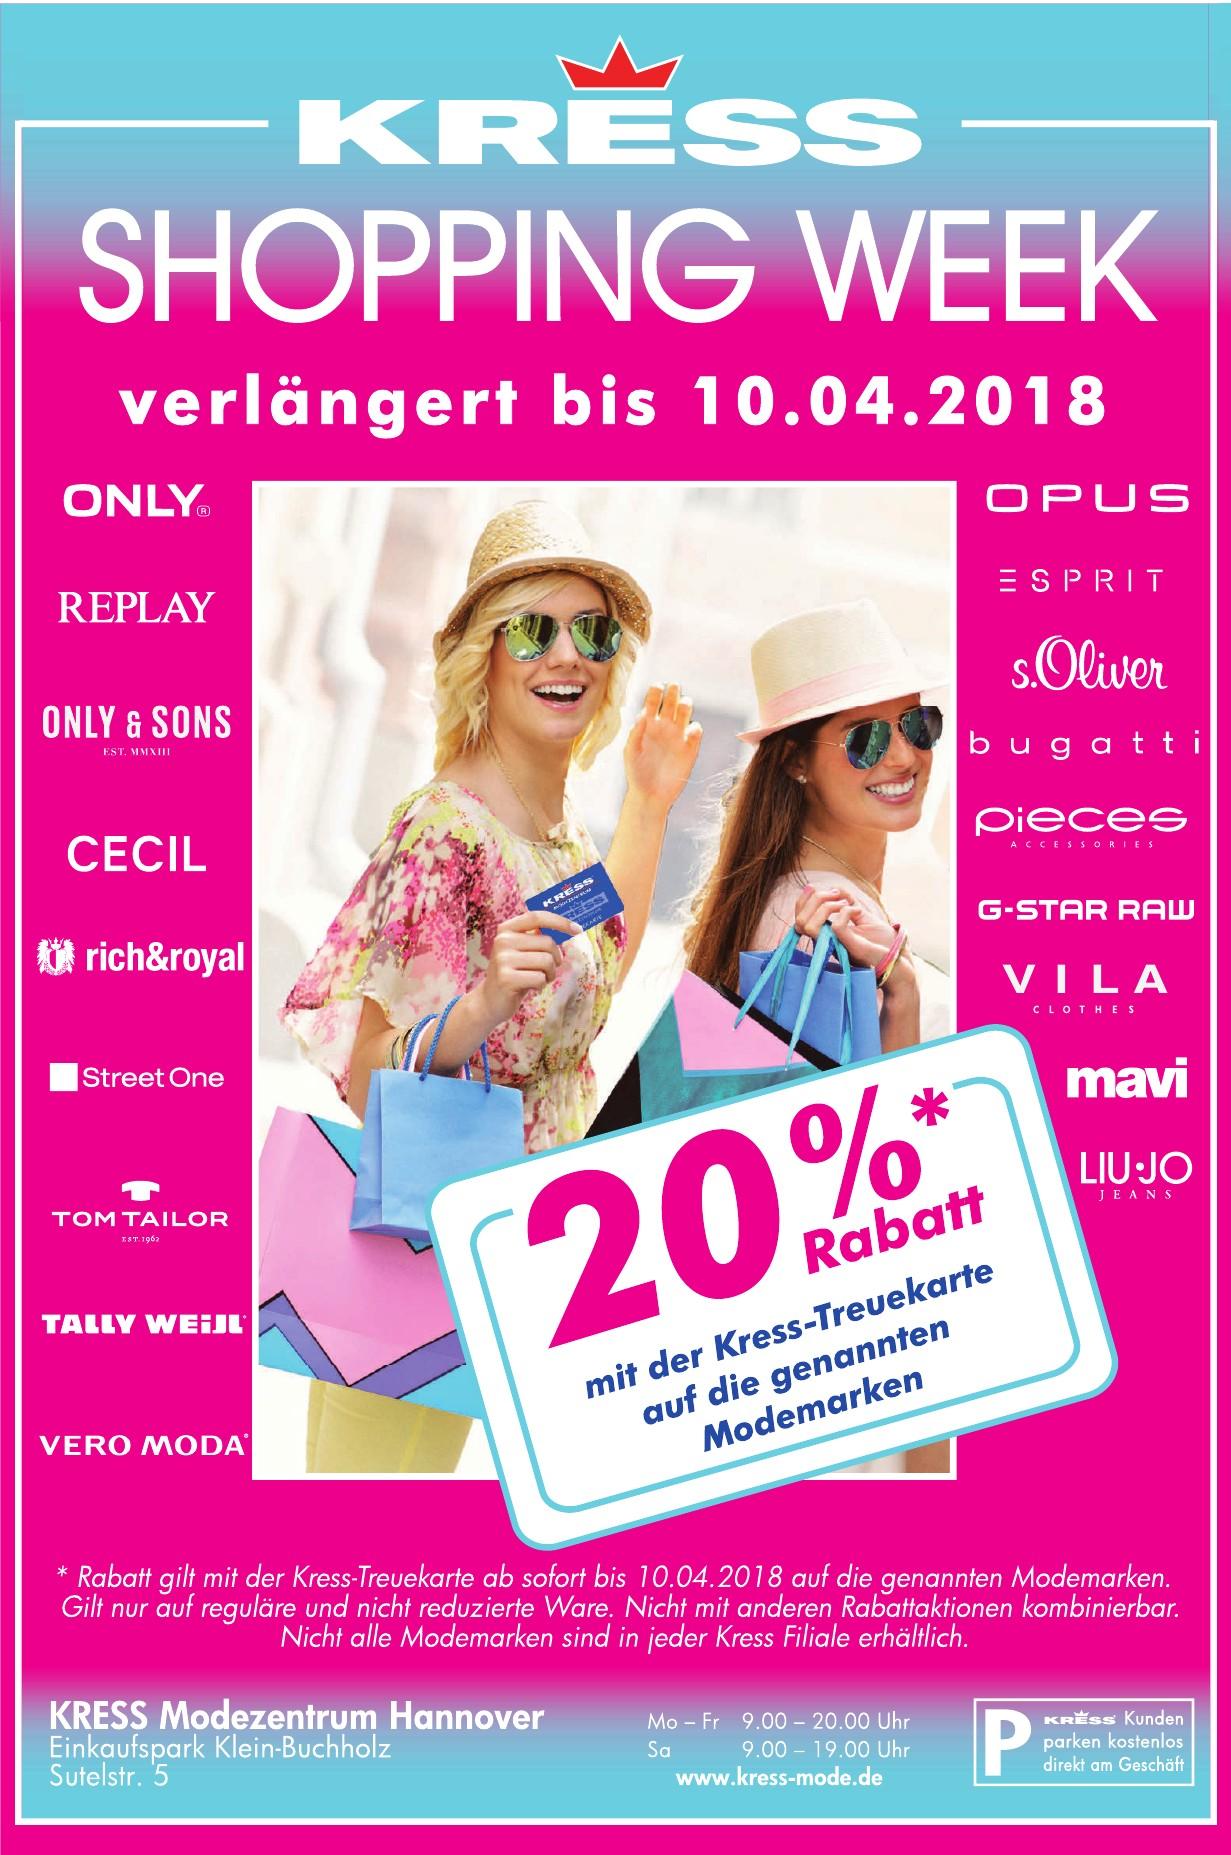 Kress Modezentrum Hannover